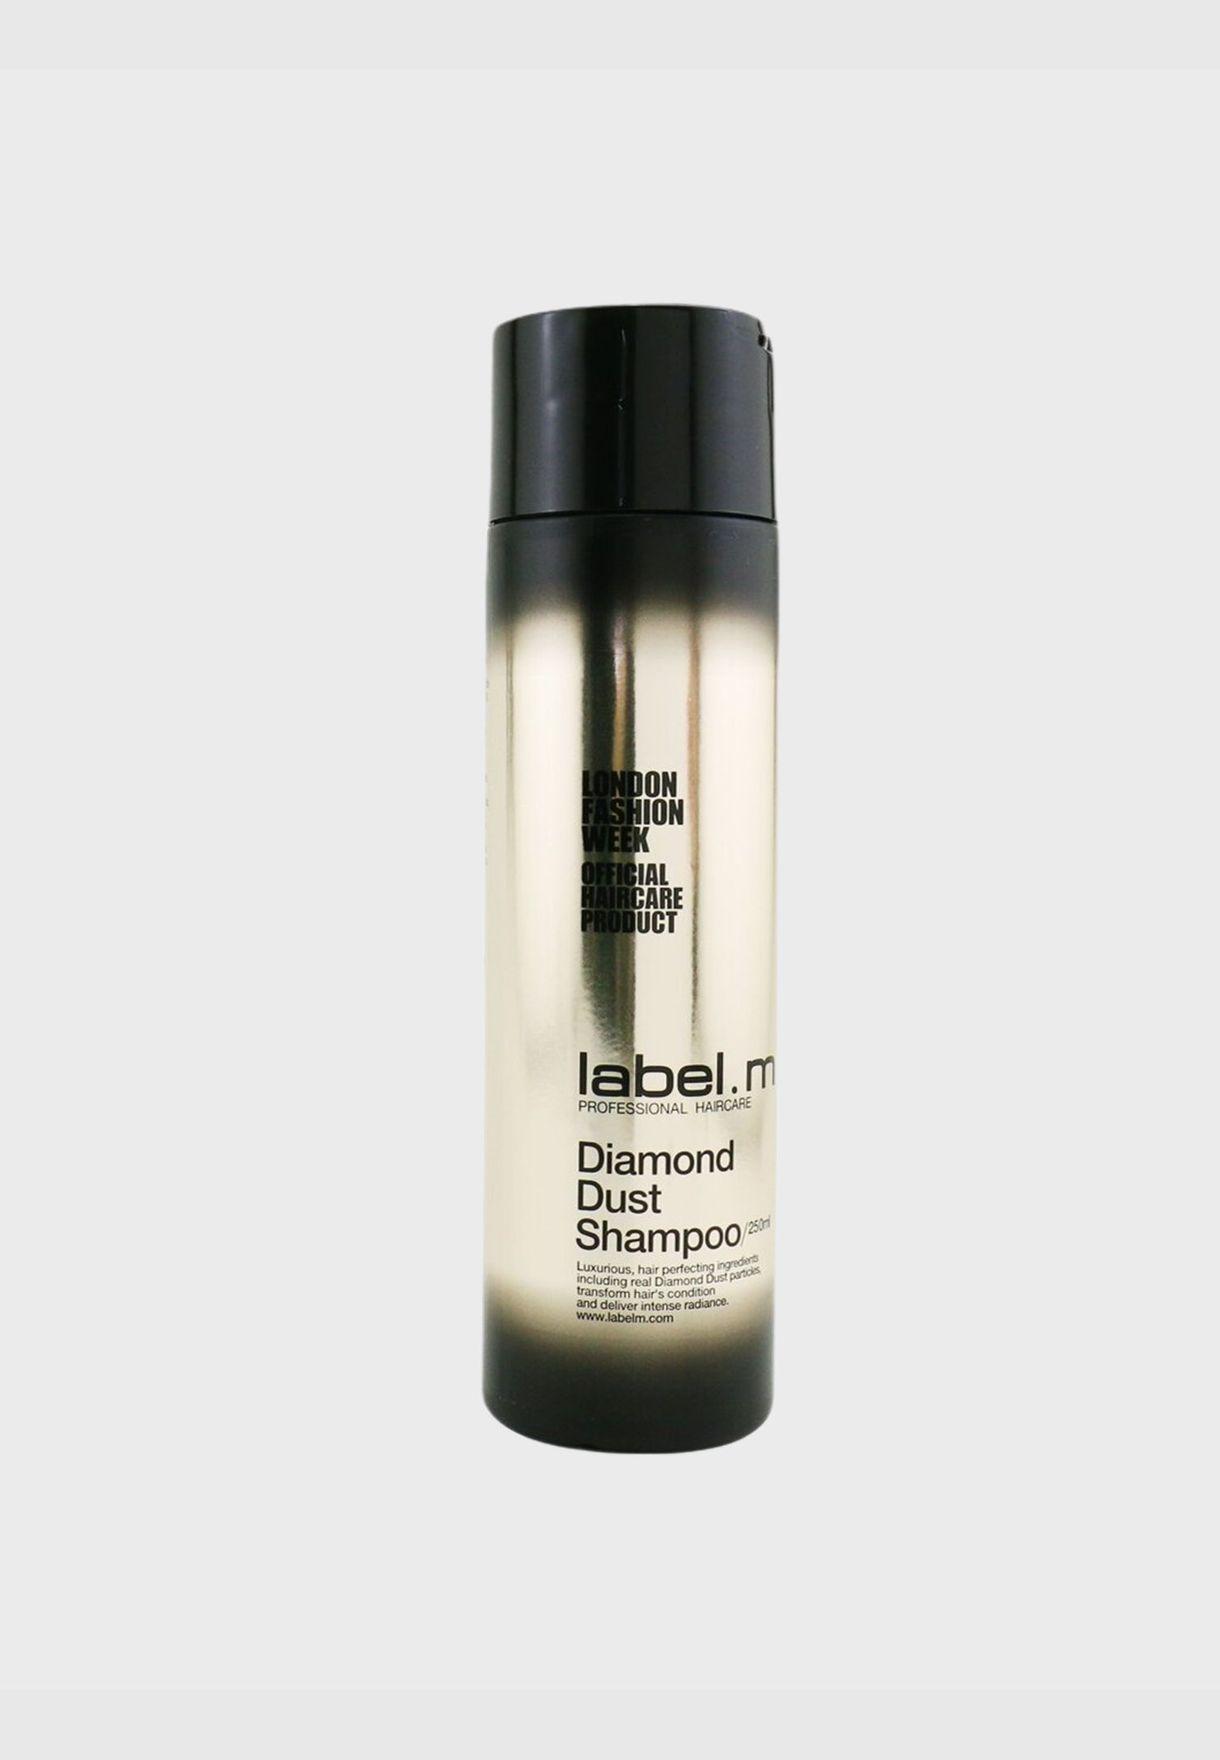 Diamond Dust Shampoo